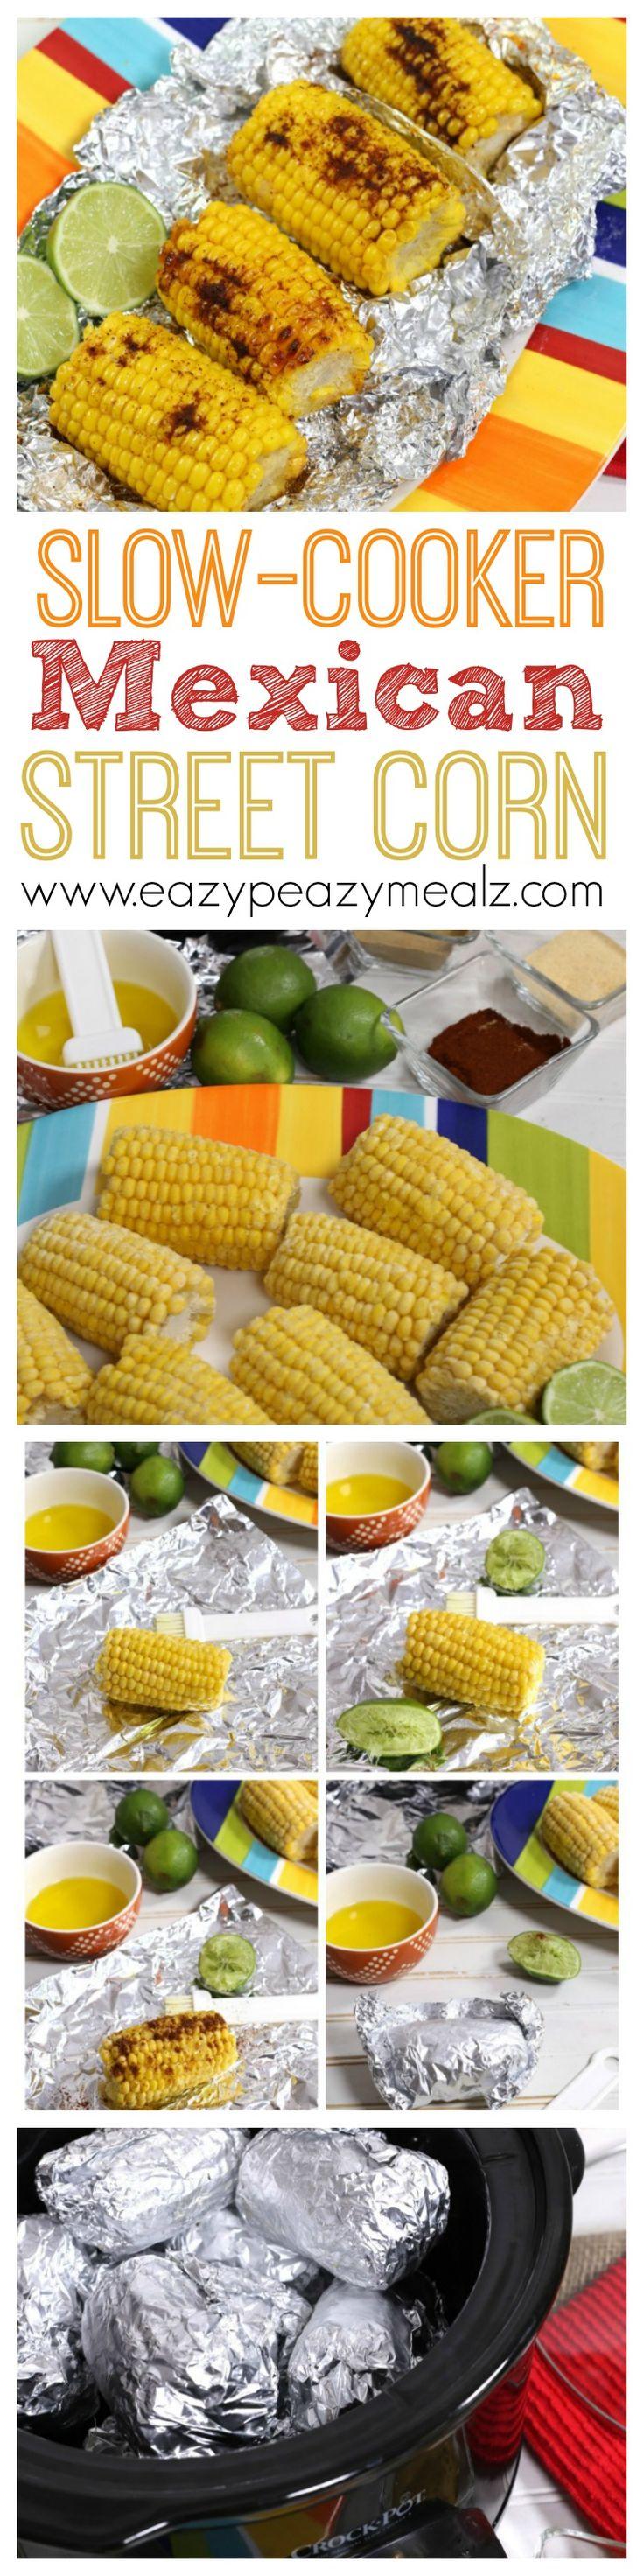 Best 25 mexican street corn ideas on pinterest street corn best 25 mexican street corn ideas on pinterest street corn mexican corn and corn soup recipes ccuart Gallery